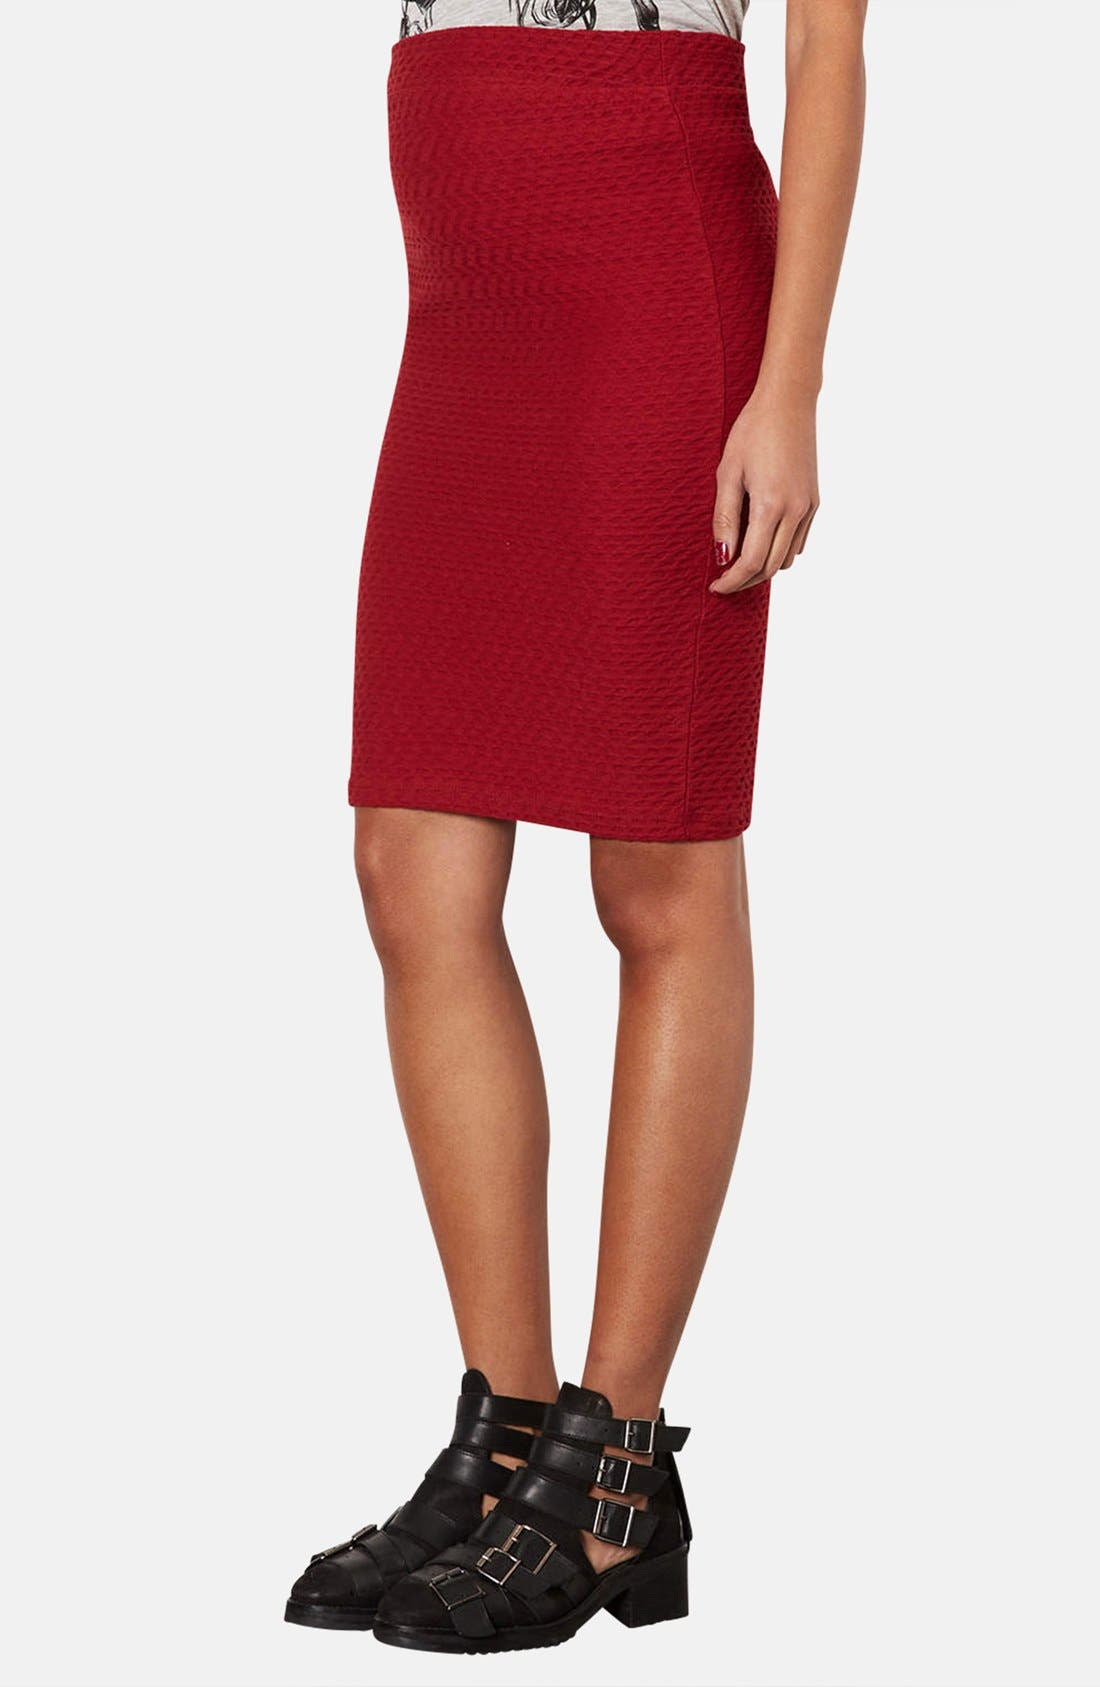 Alternate Image 1 Selected - Topshop Chevron Texture Maternity Tube Skirt